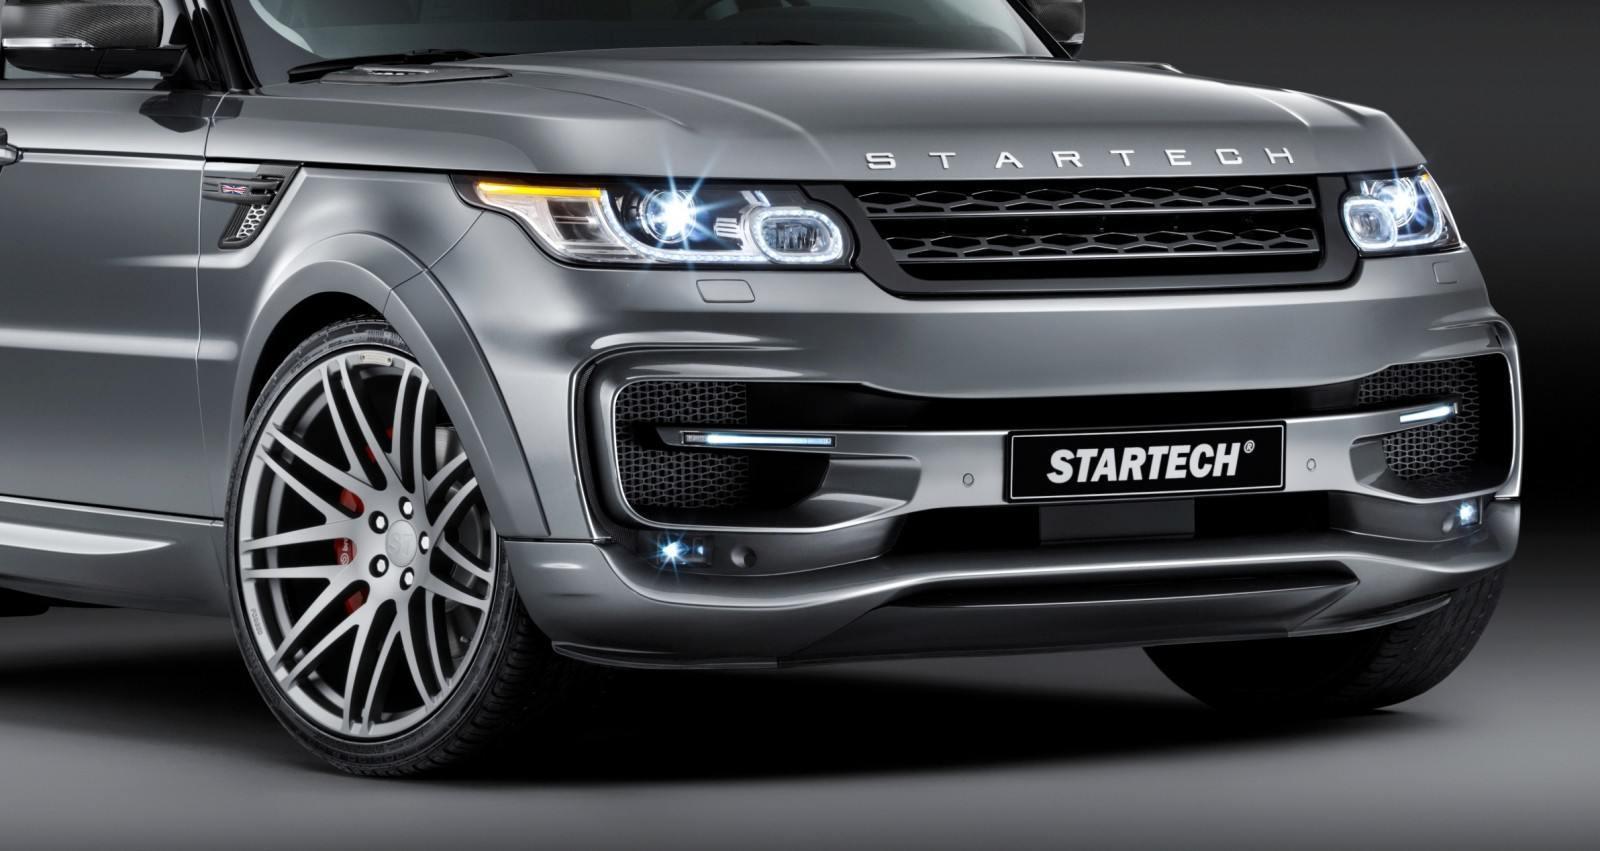 2014 Range Rover Sport STARTECH Widebody on 23-Inch Wheels Looks Amazing 5